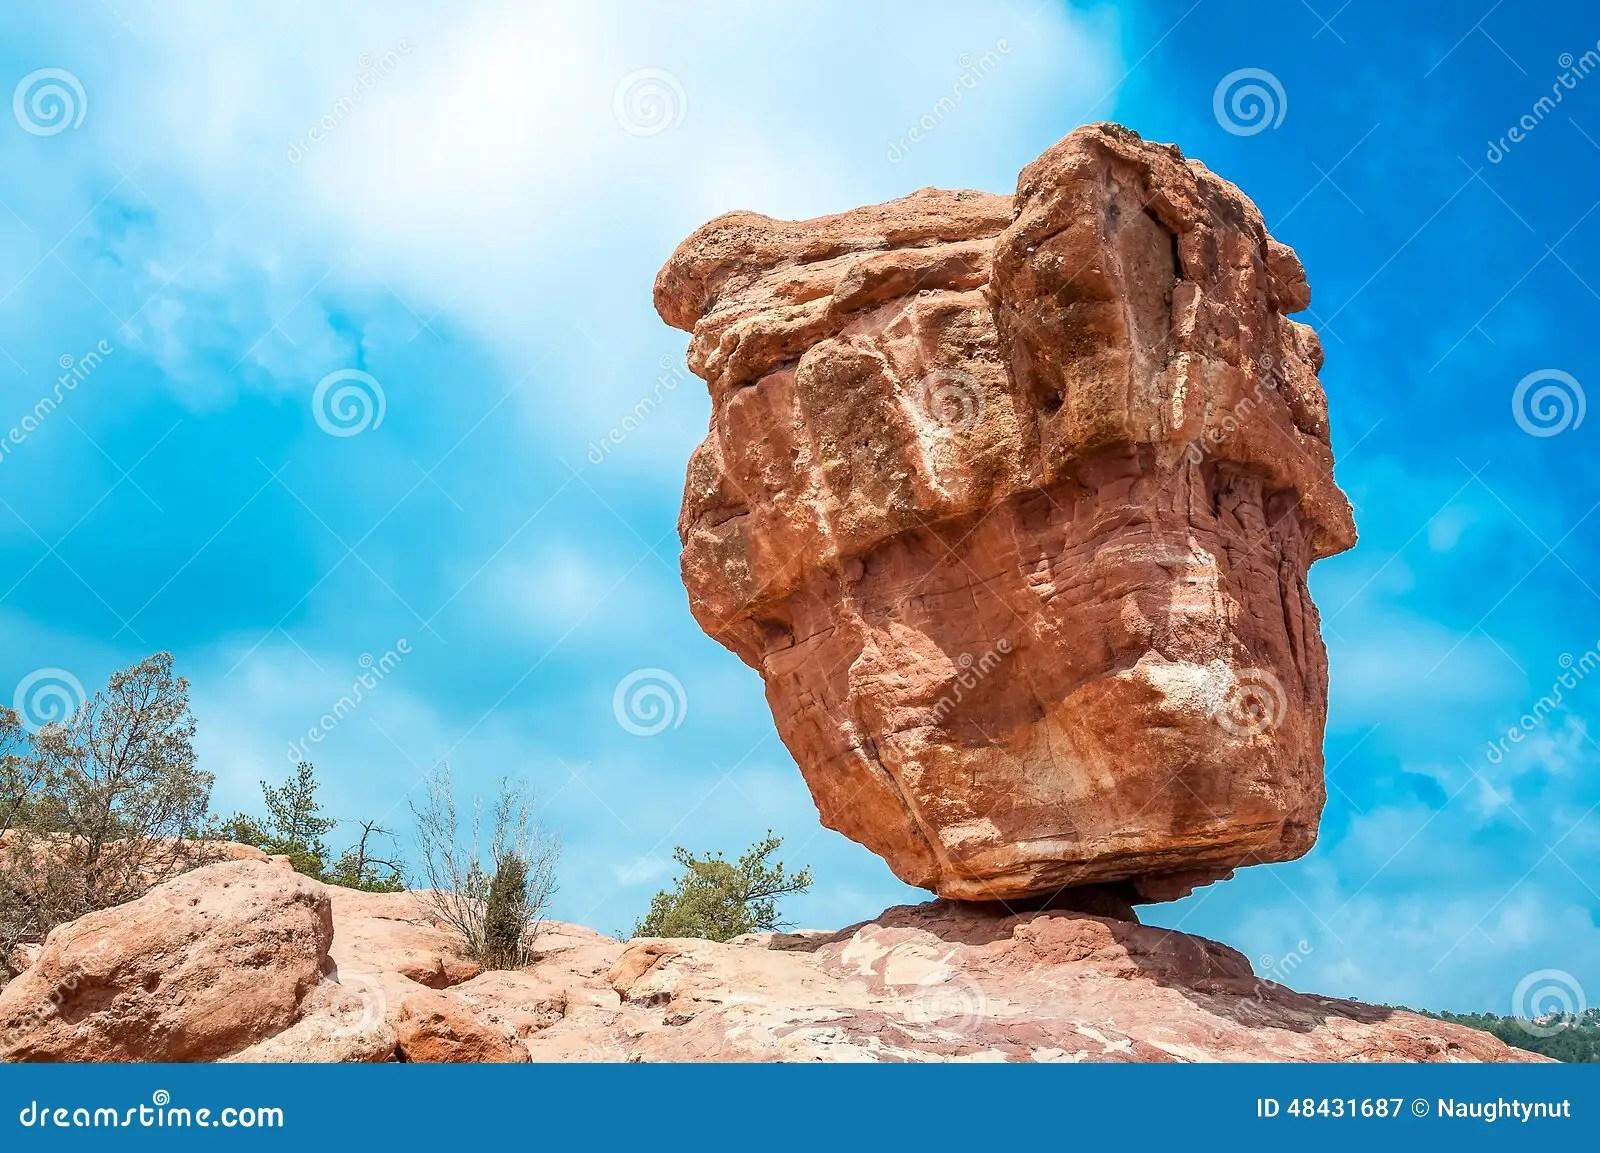 Where Buy Big Rocks Garden